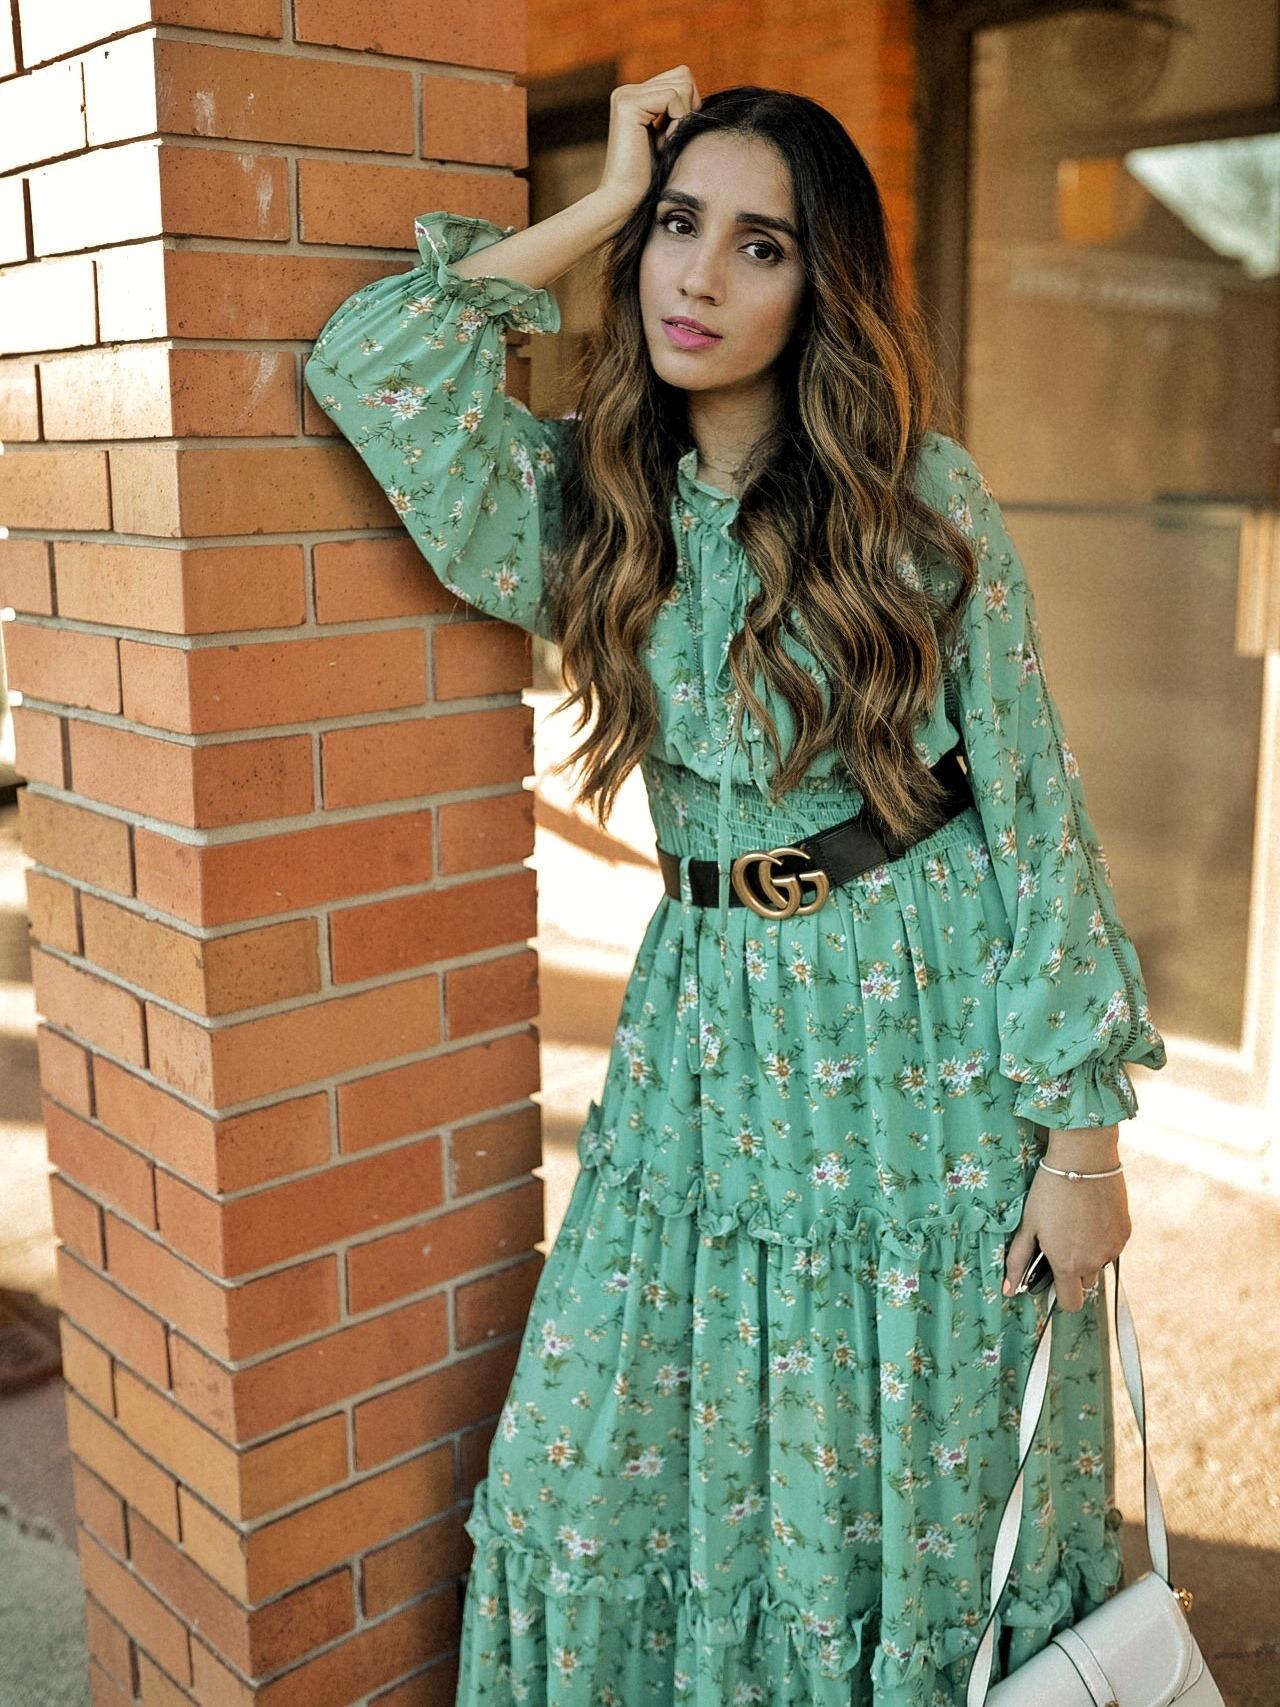 Summer Dress 2019 Roundups Part 1 Faiza Inam Sincerelyhumble maxi dresses Lulus midi dresses DELPHINE SAGE GREEN FLORAL PRINT 2